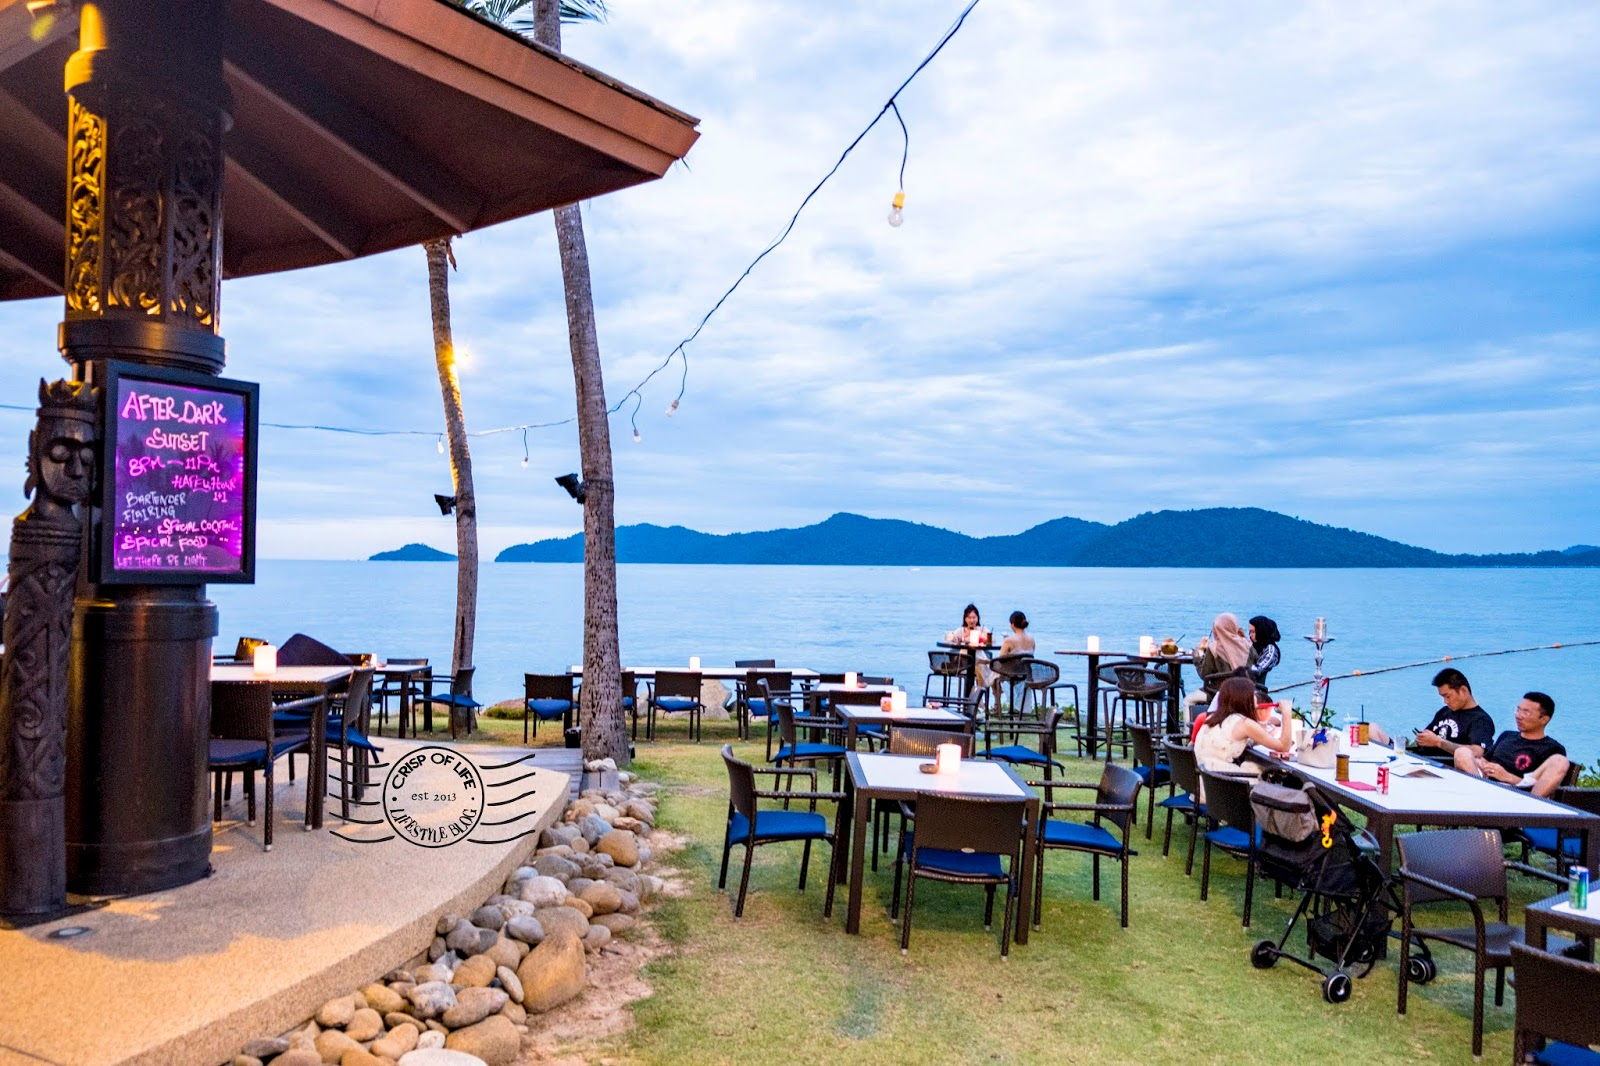 Best Sunset View at Kota Kinabalu @ Sunset Bar, Shangri-La's Tanjung Aru Resort & Spa, Kota Kinabalu, Sabah